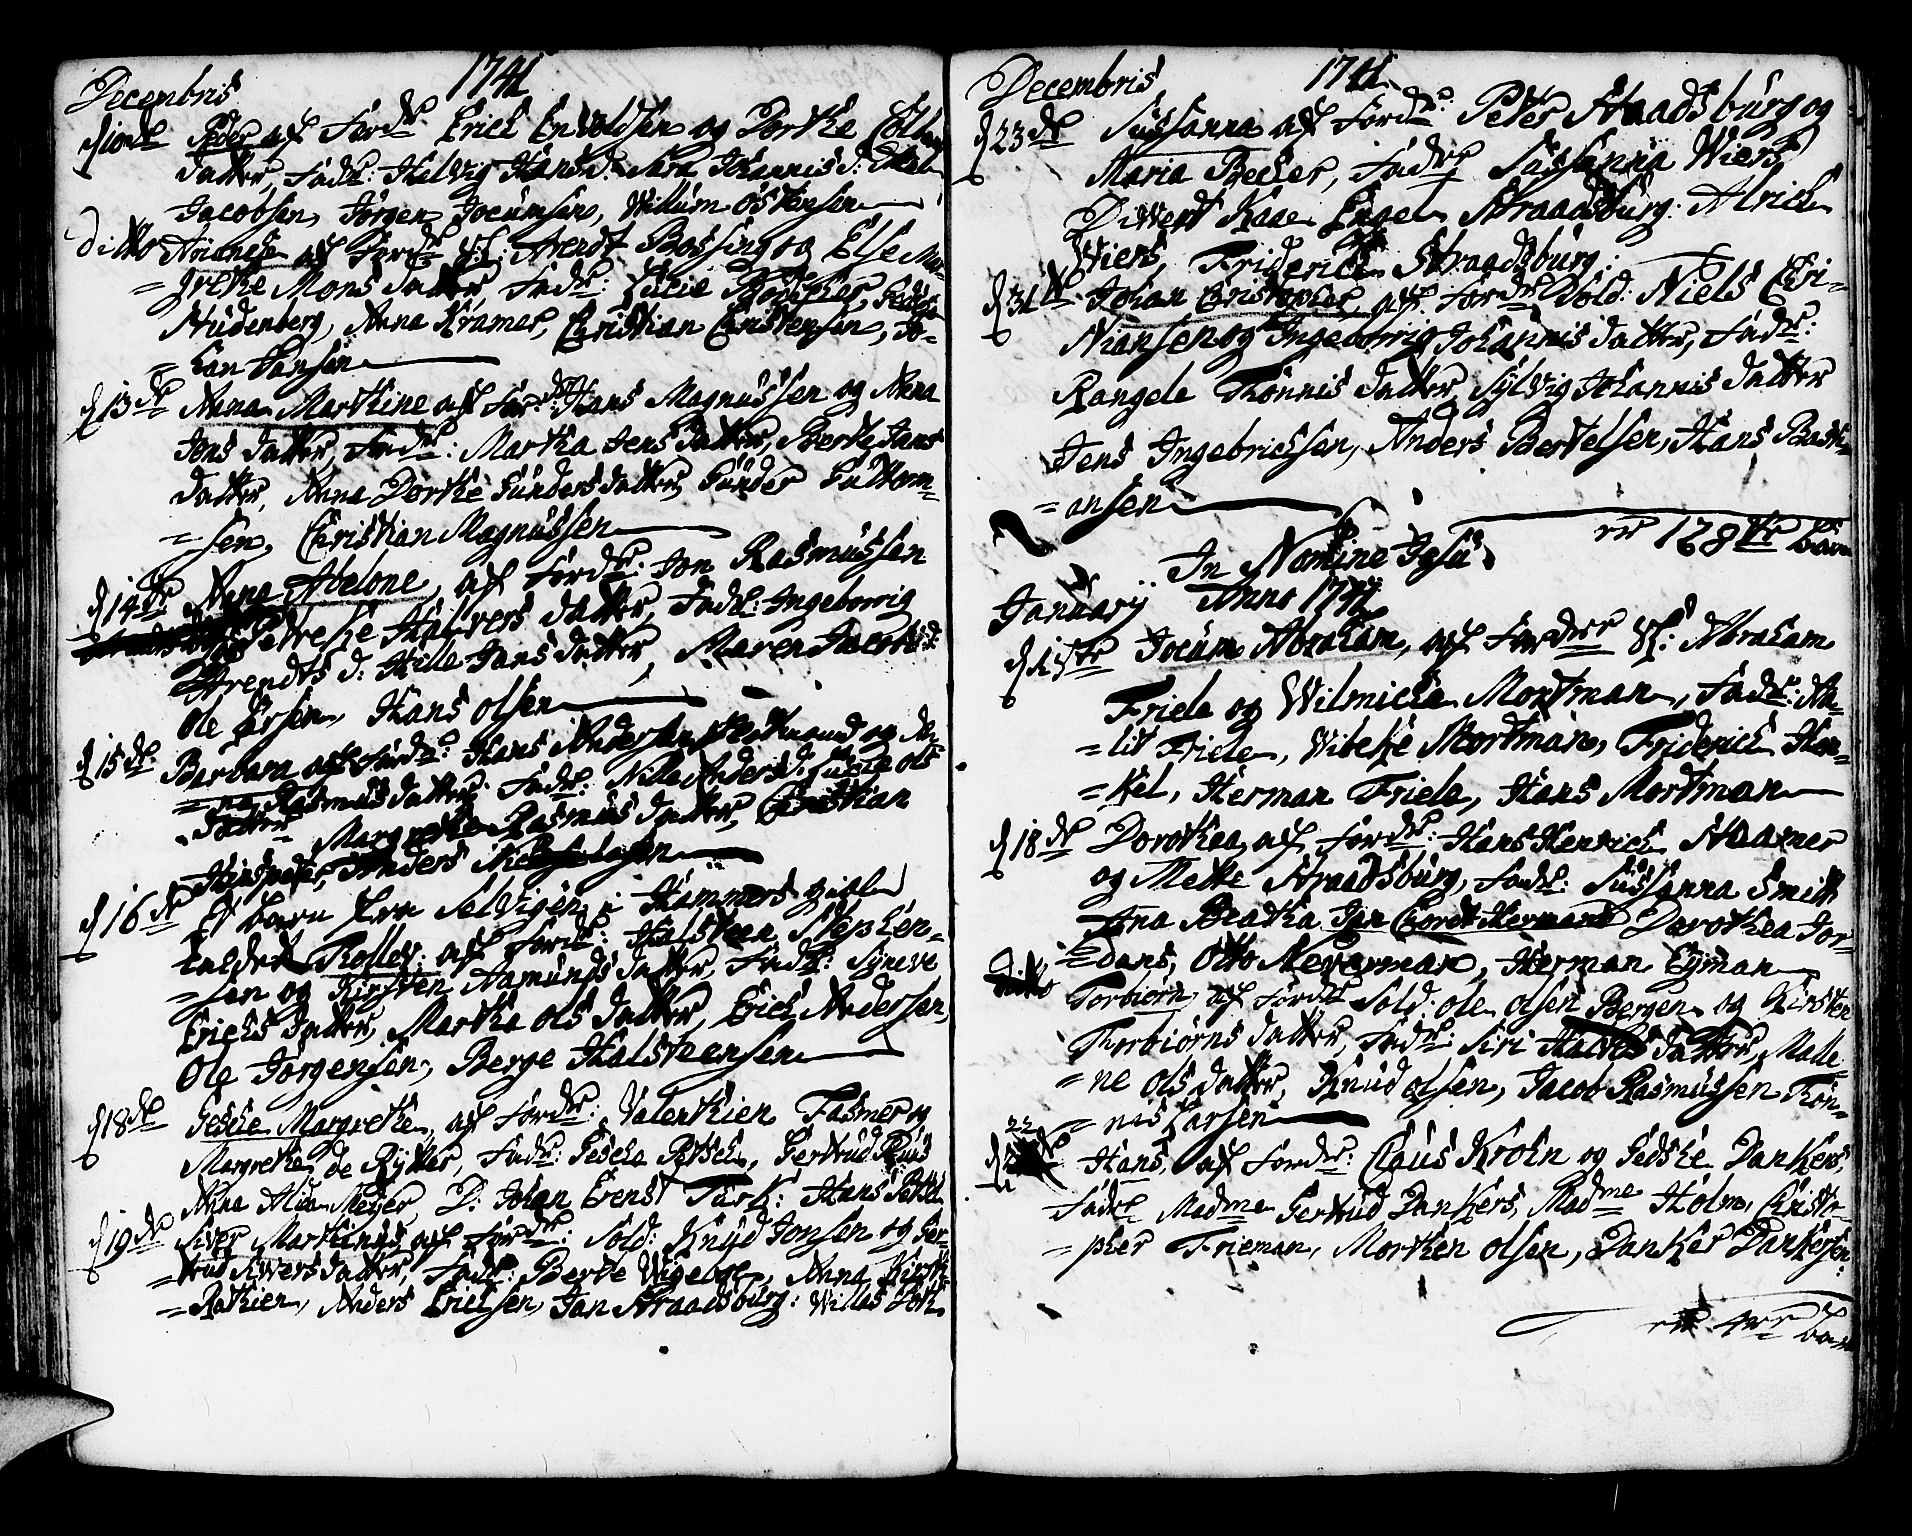 SAB, Korskirken Sokneprestembete, H/Haa/L0004: Ministerialbok nr. A 4, 1720-1750, s. 229